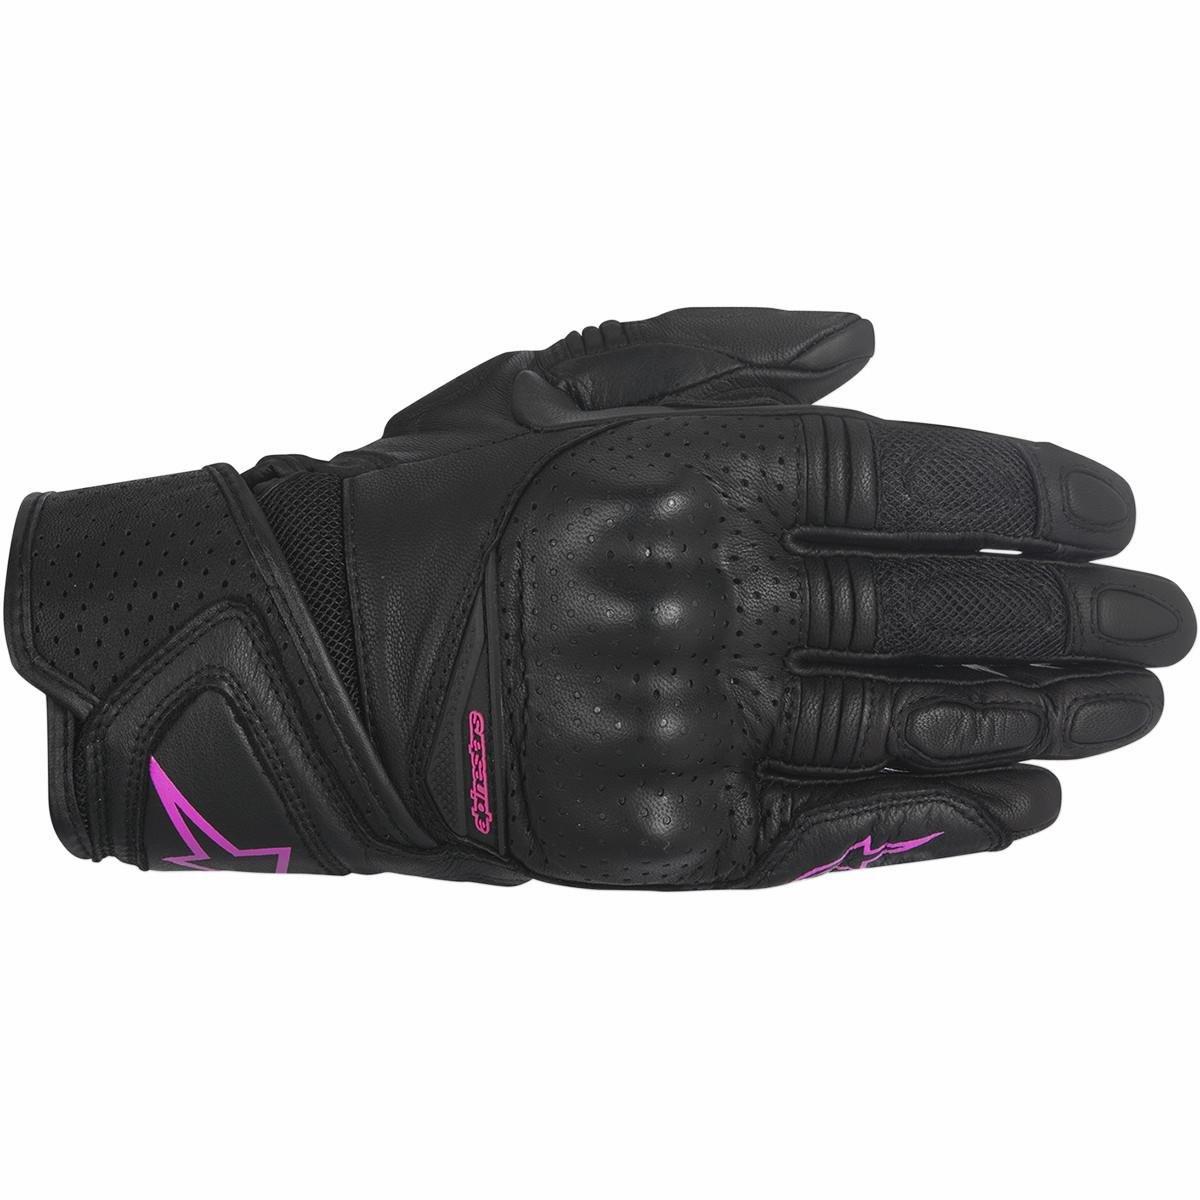 Motorcycle Alpinestars Stella Baika Gloves - Black Pink UK 18051194898647